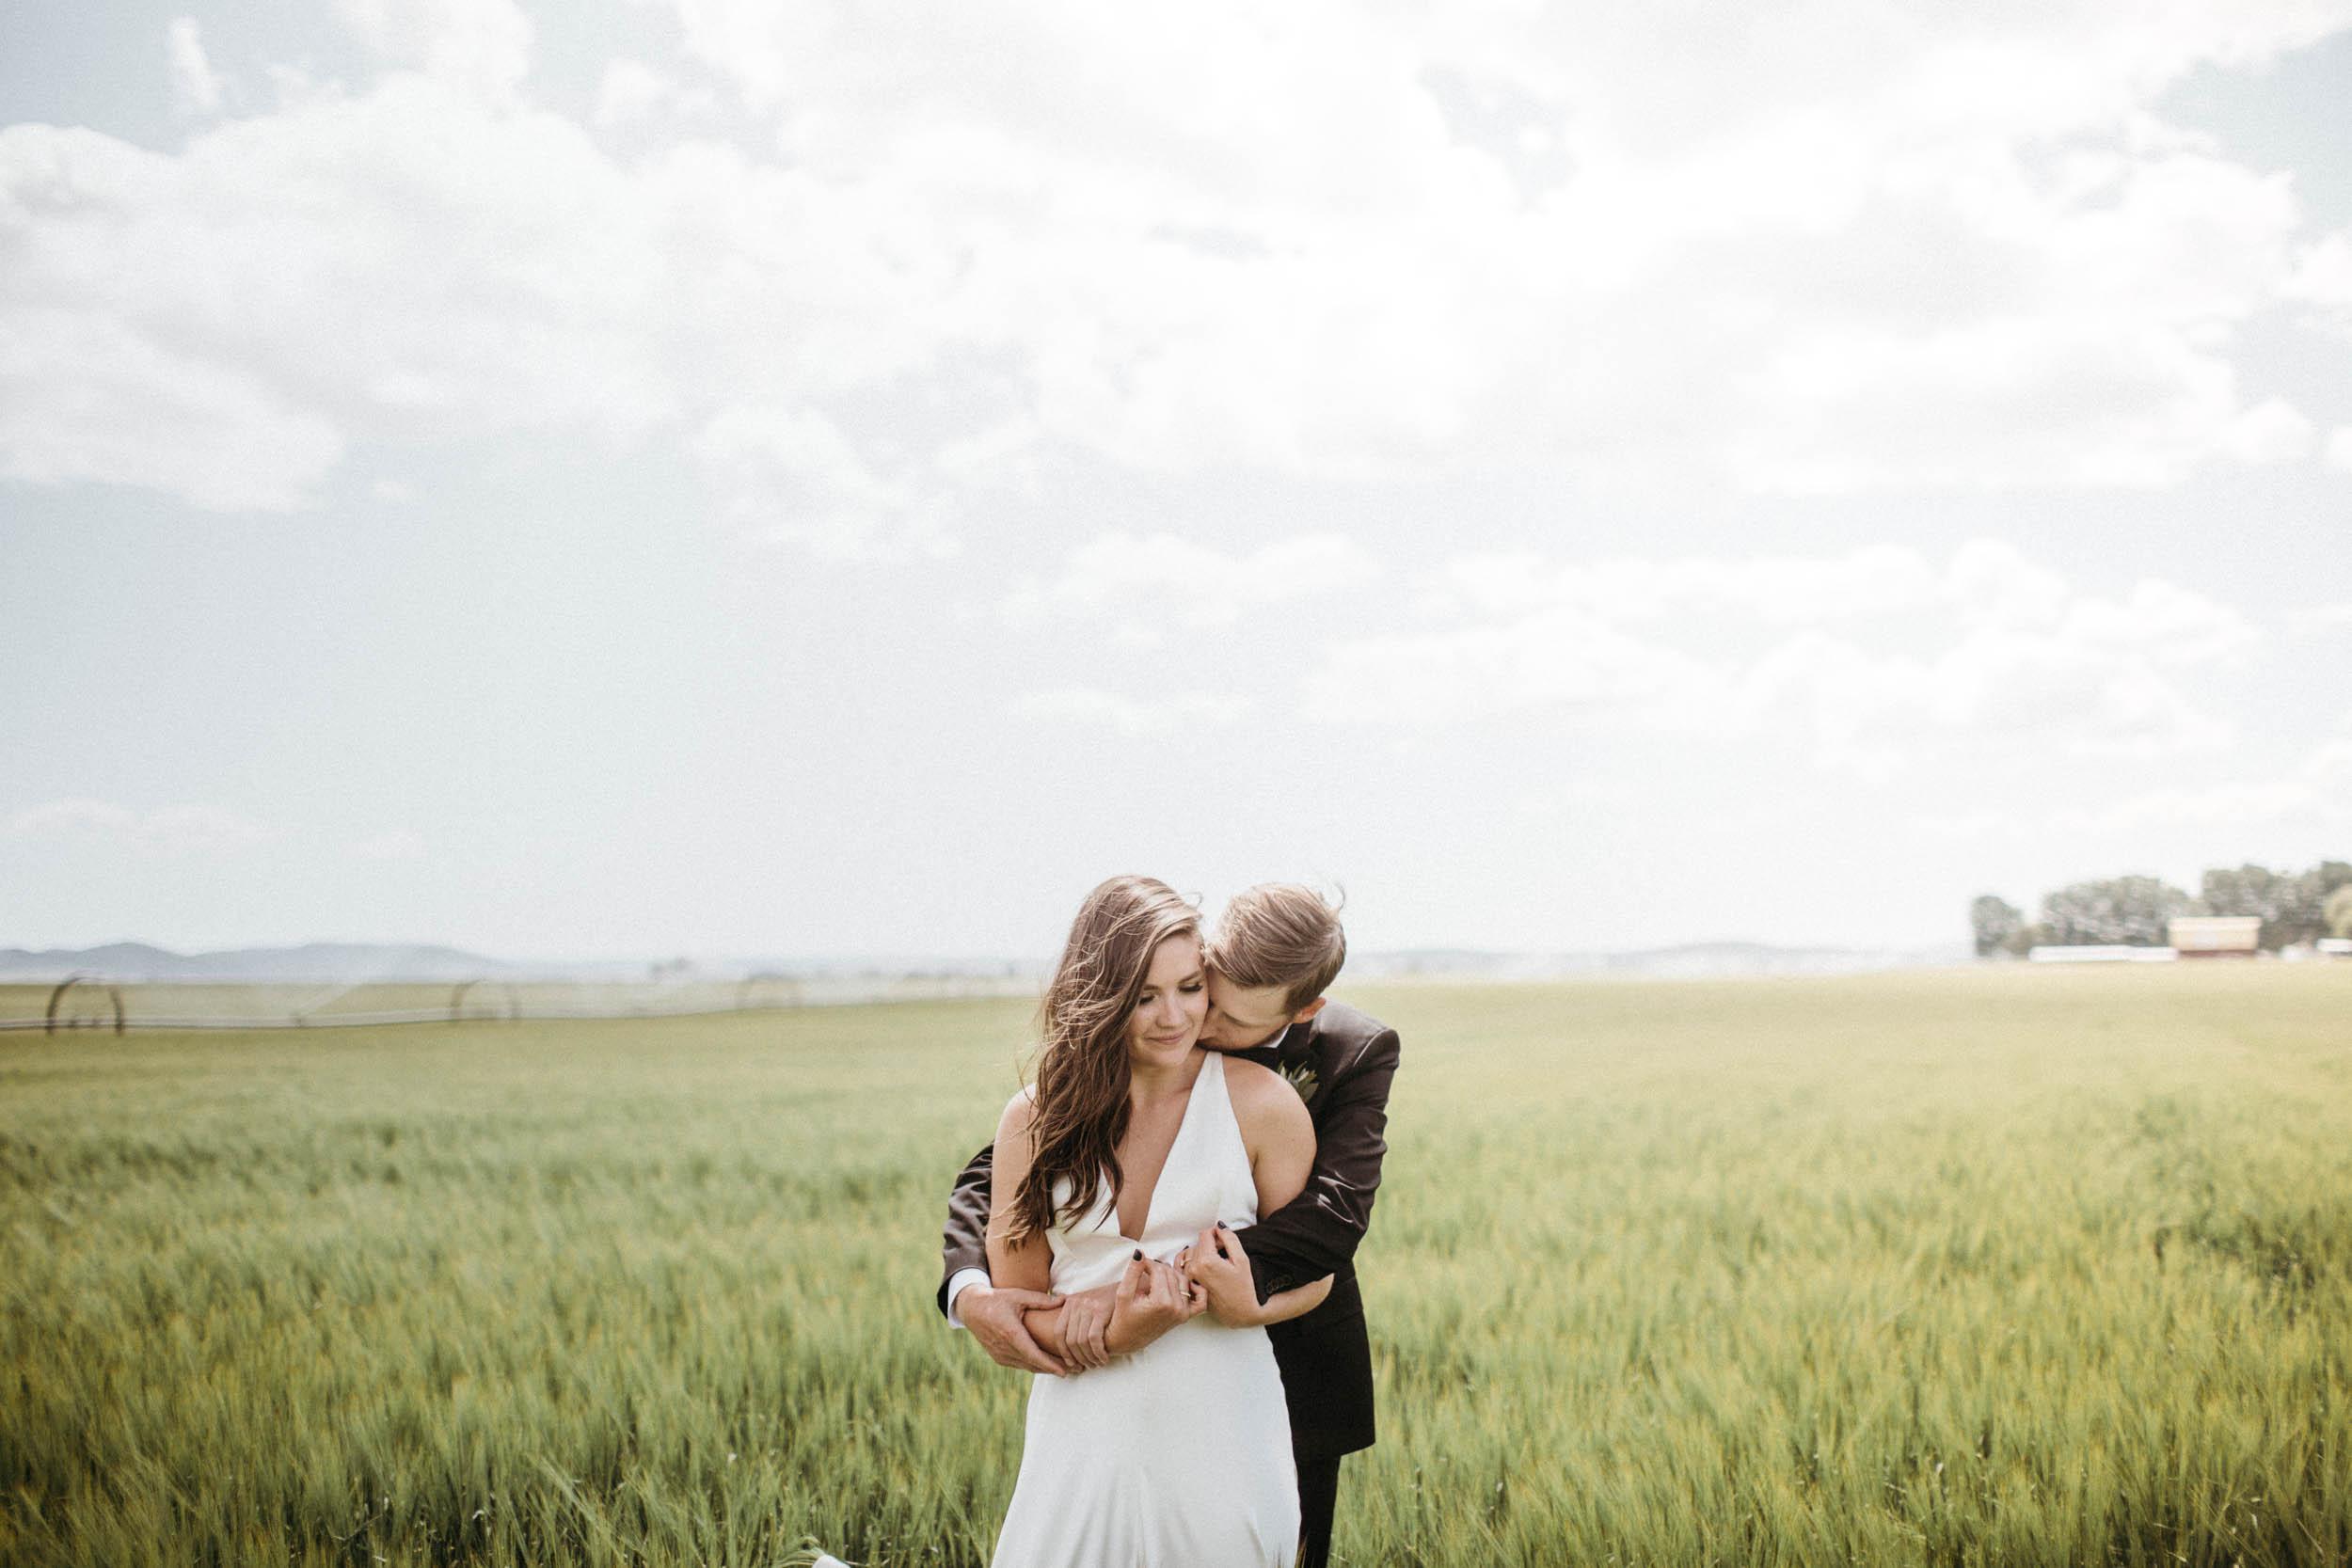 d_M_Sun_valley_wedding-85.jpg